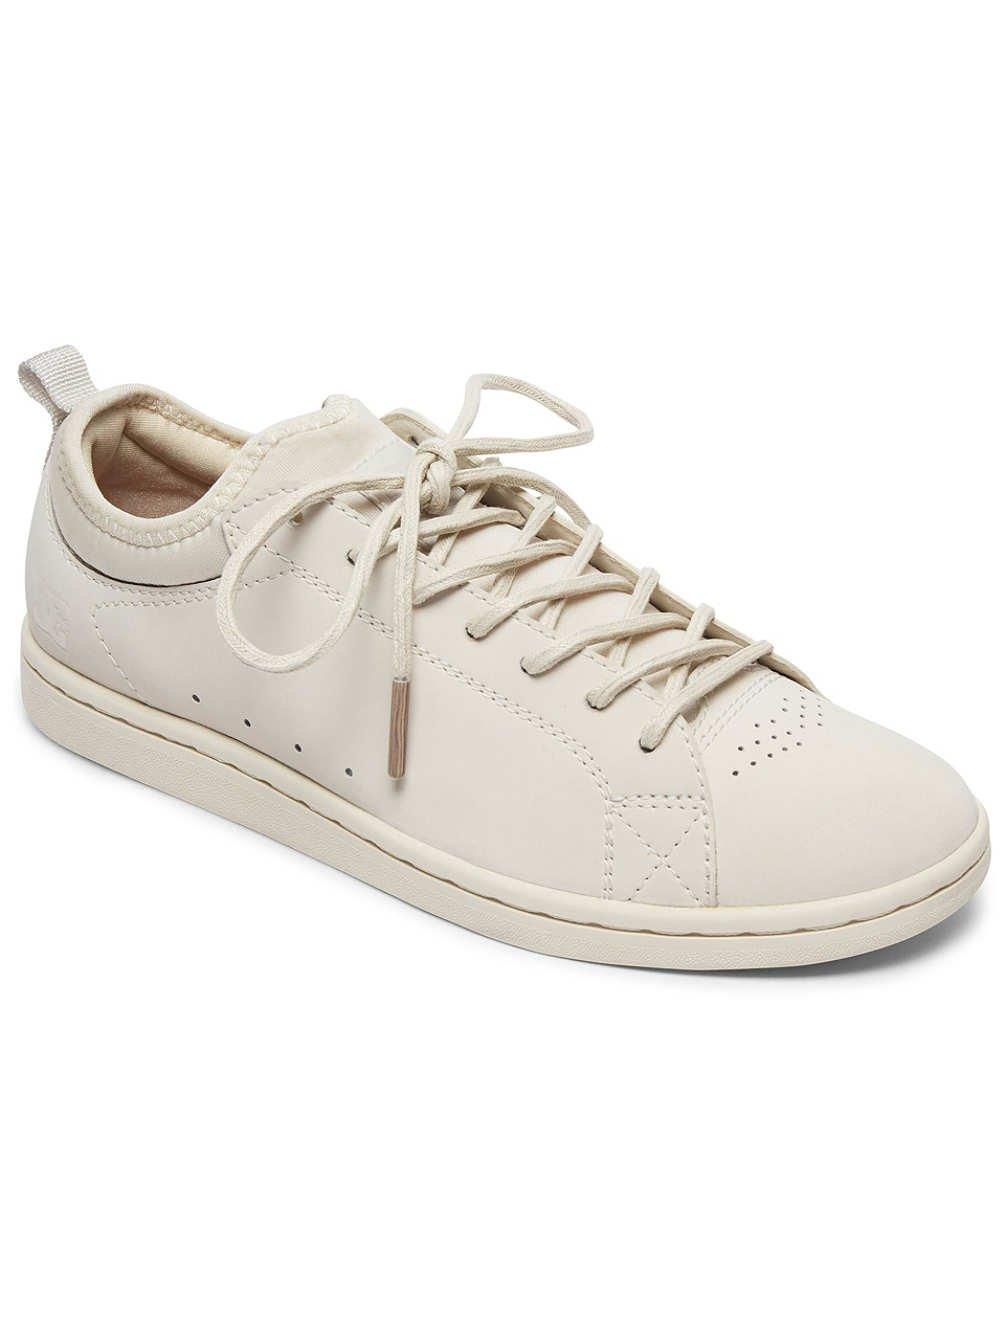 DC Shoes Magnolia Se, Zapatillas para Mujer 39 EU|Beis